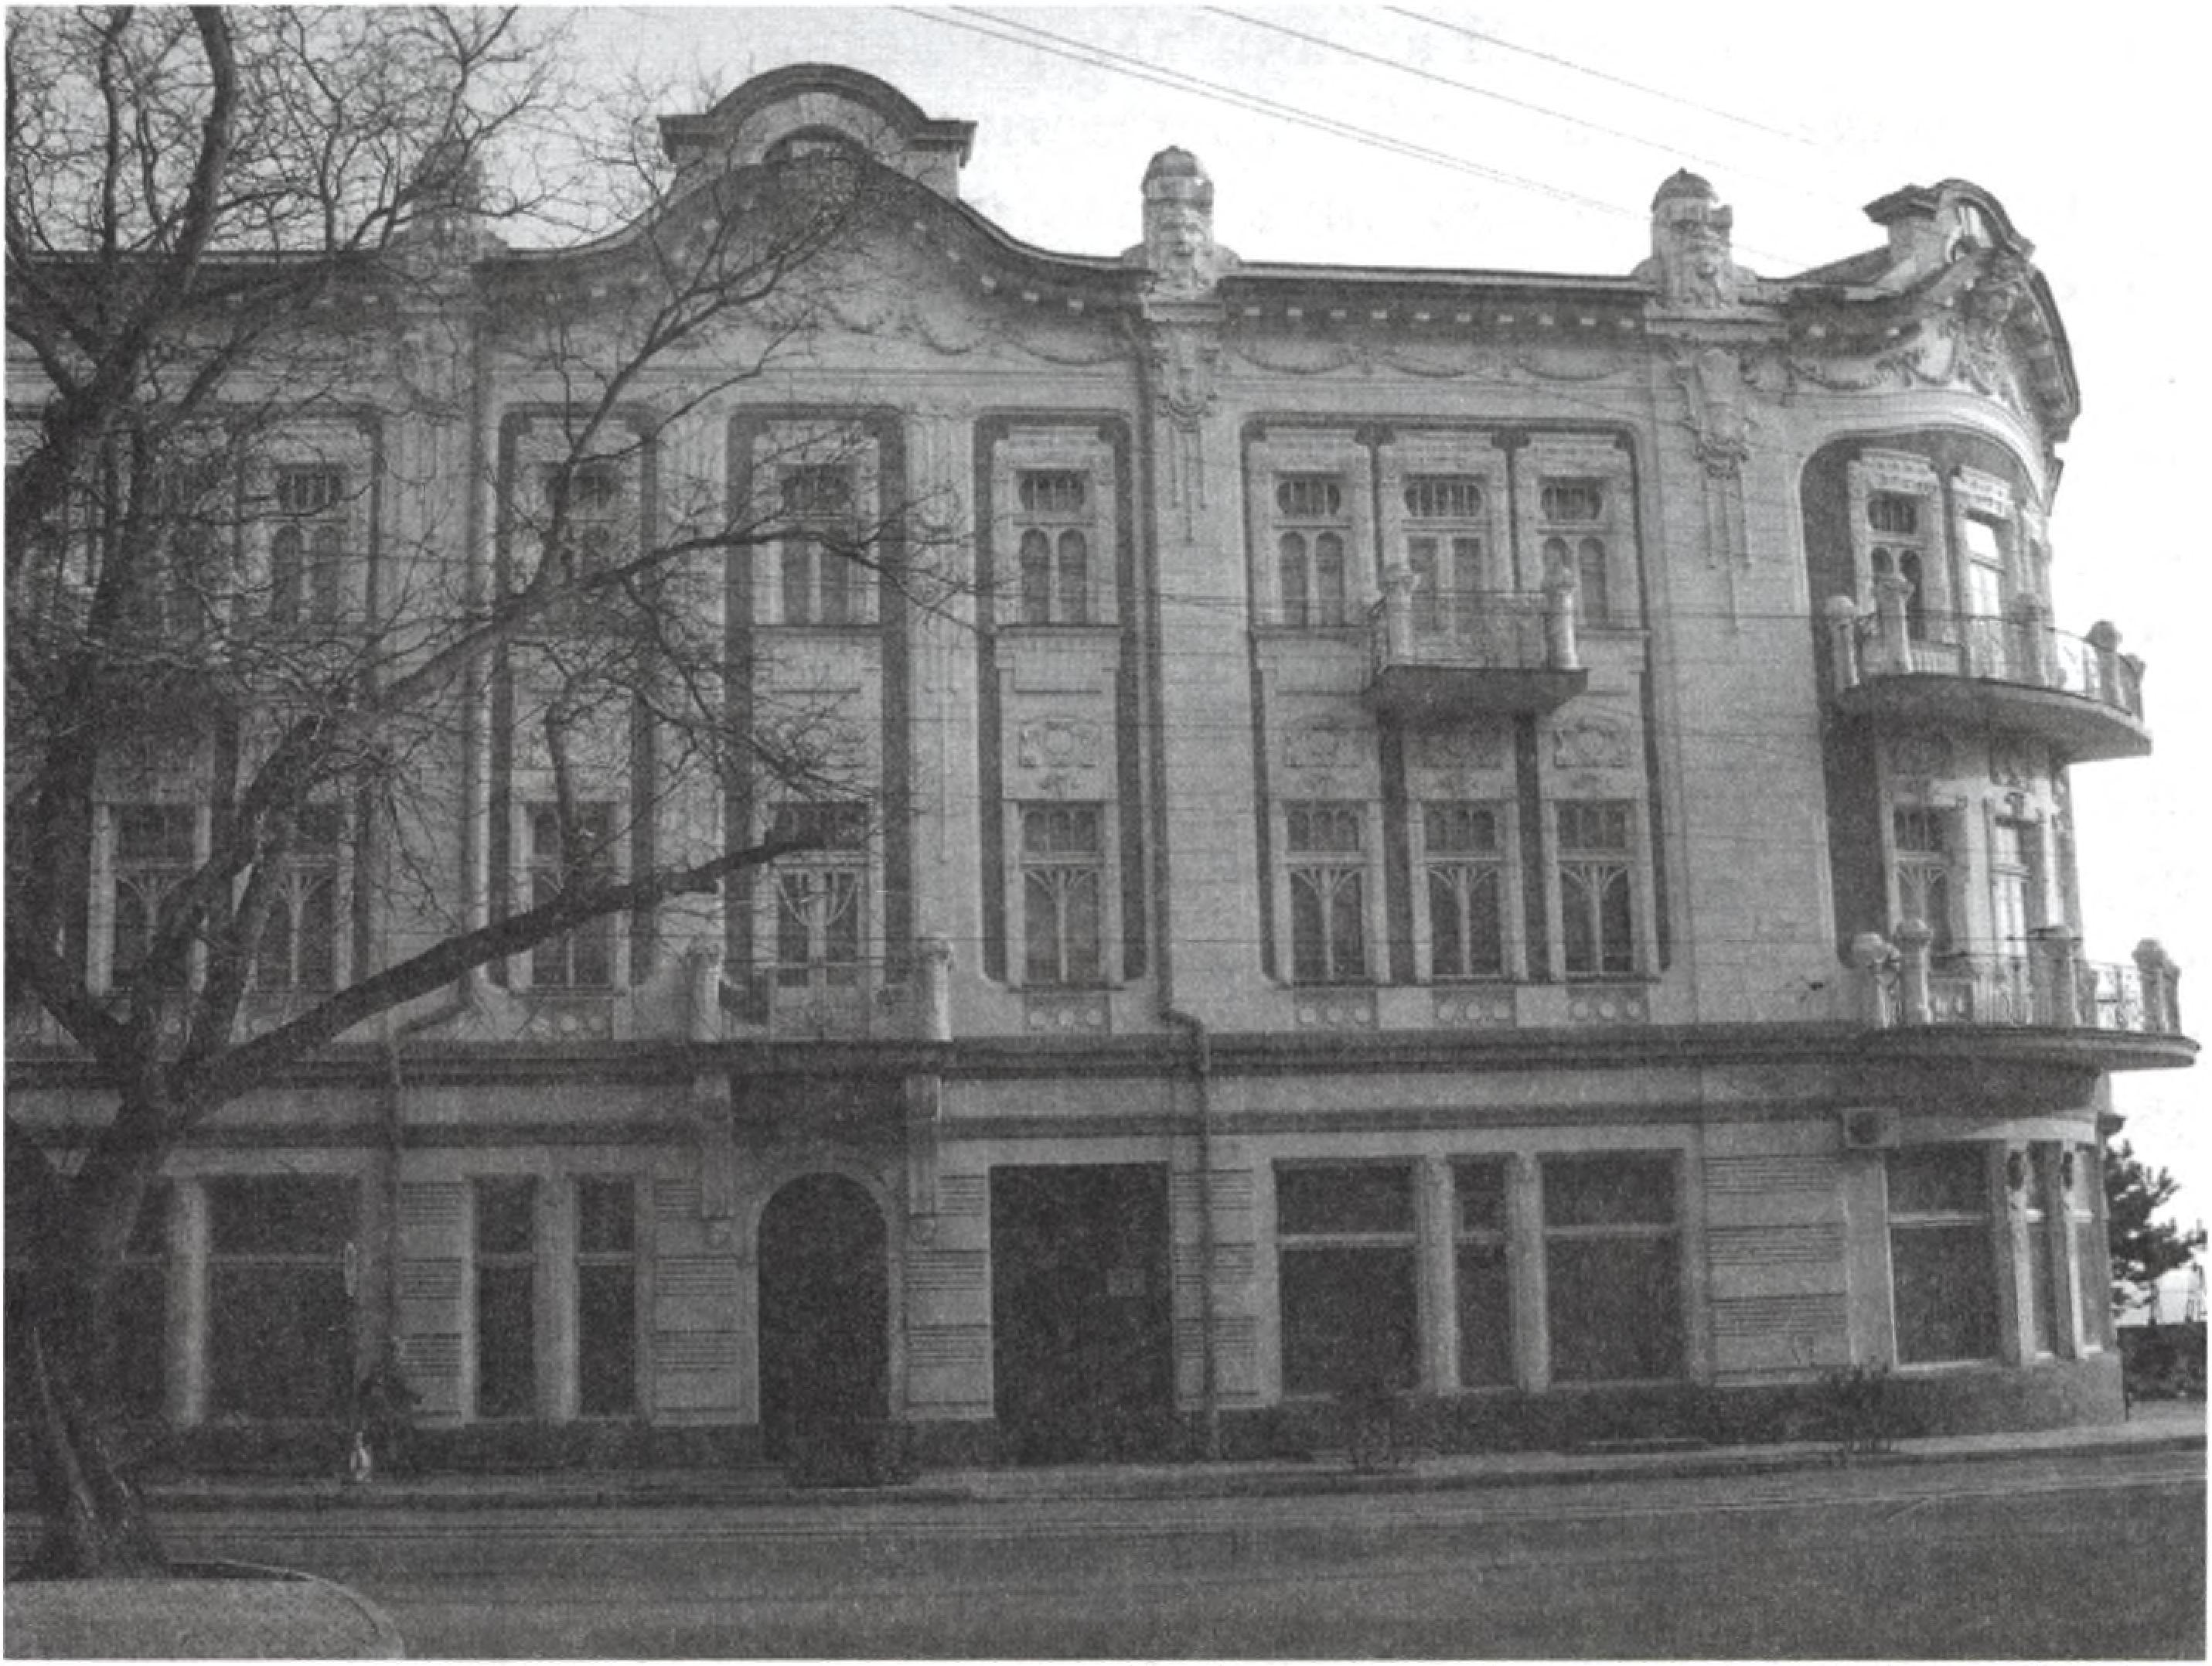 Гостиница «Бо-Риваж» («Beau-Rivage»). 1915—1916 гг. Северный фасад. Фото В.М. Заскоки